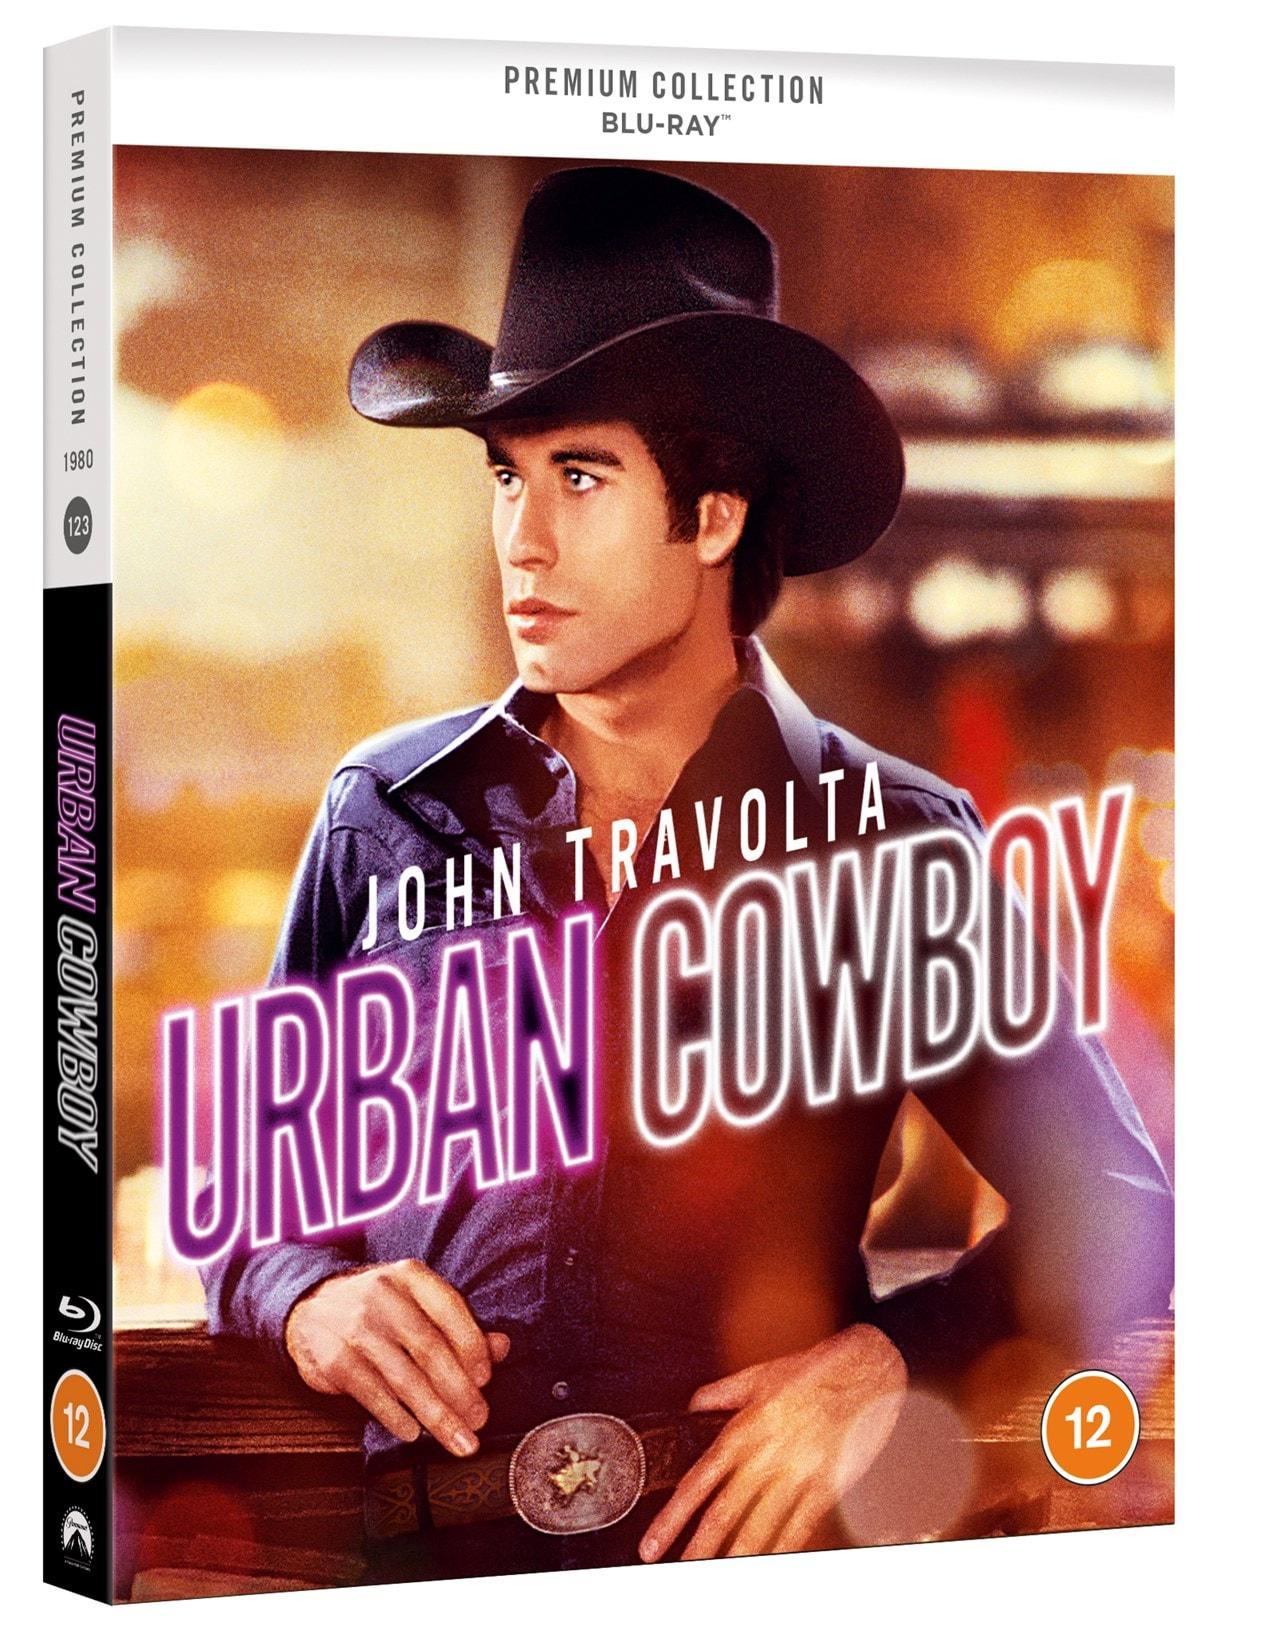 Urban Cowboy (hmv Exclusive) - The Premium Collection - 3